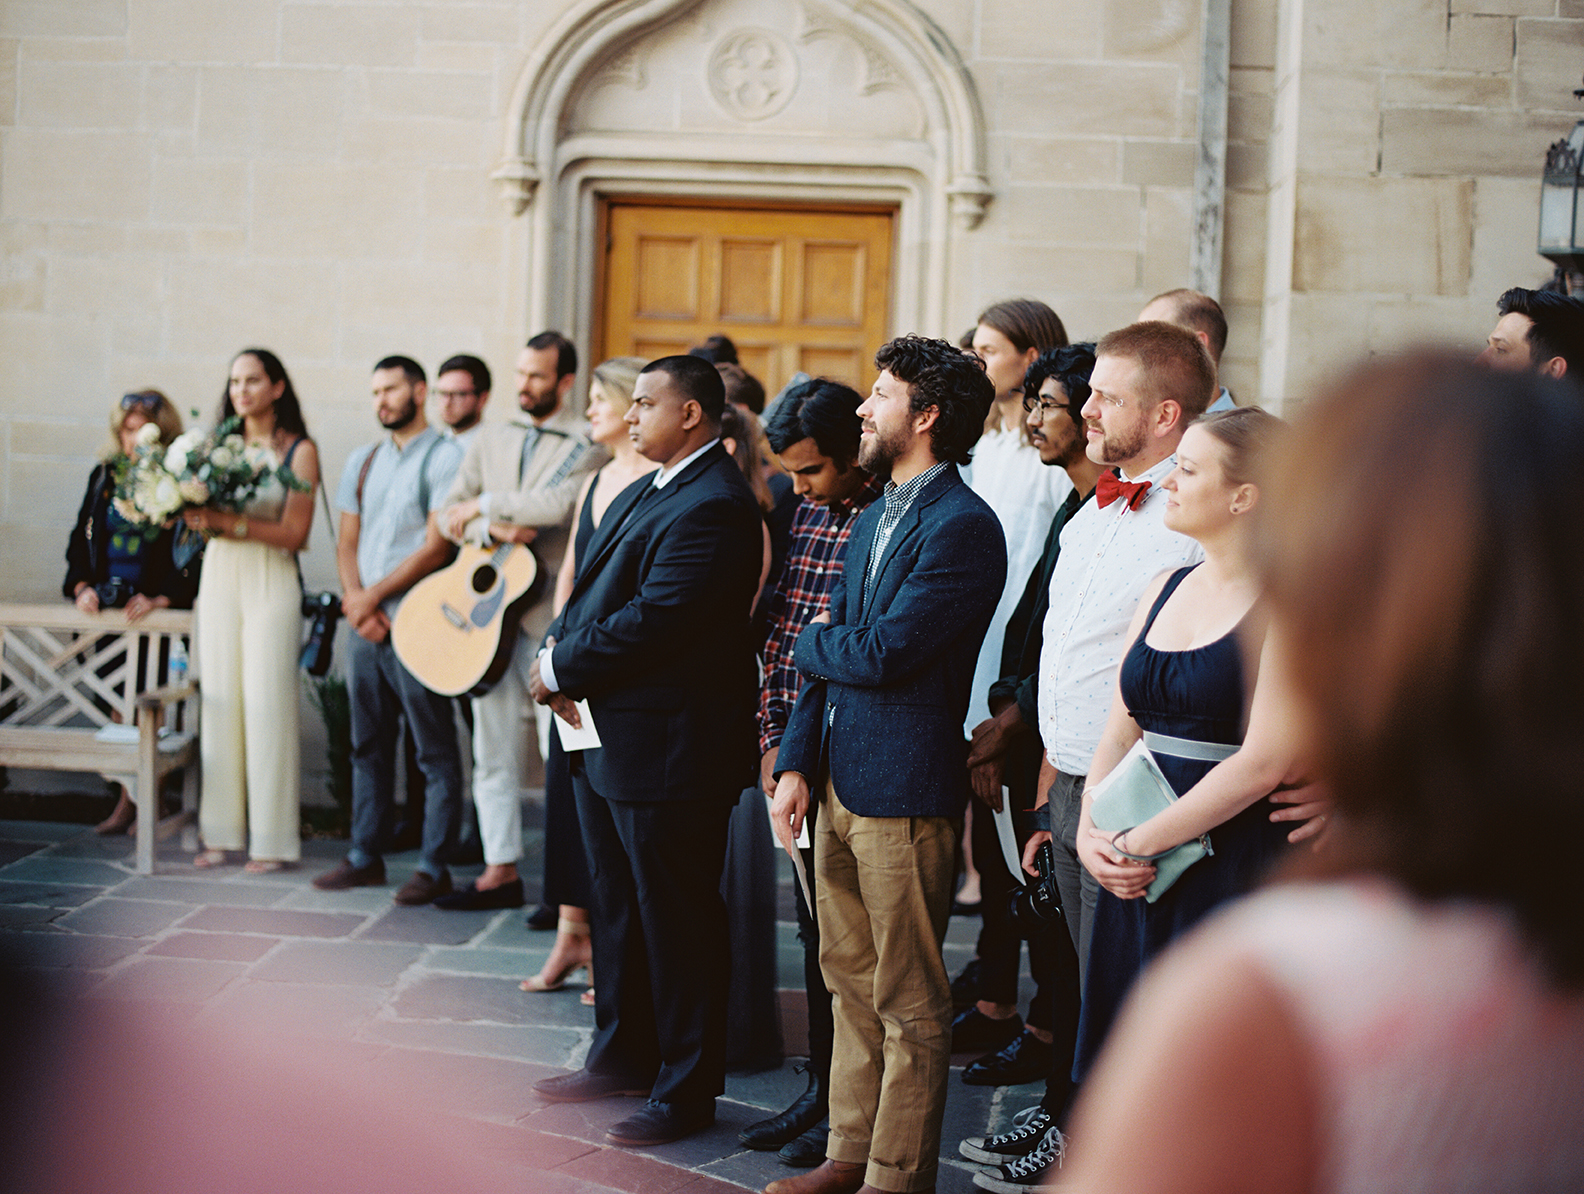 216-brian-sarra-los-angeles-wedding-brumley-wells-photography.jpg